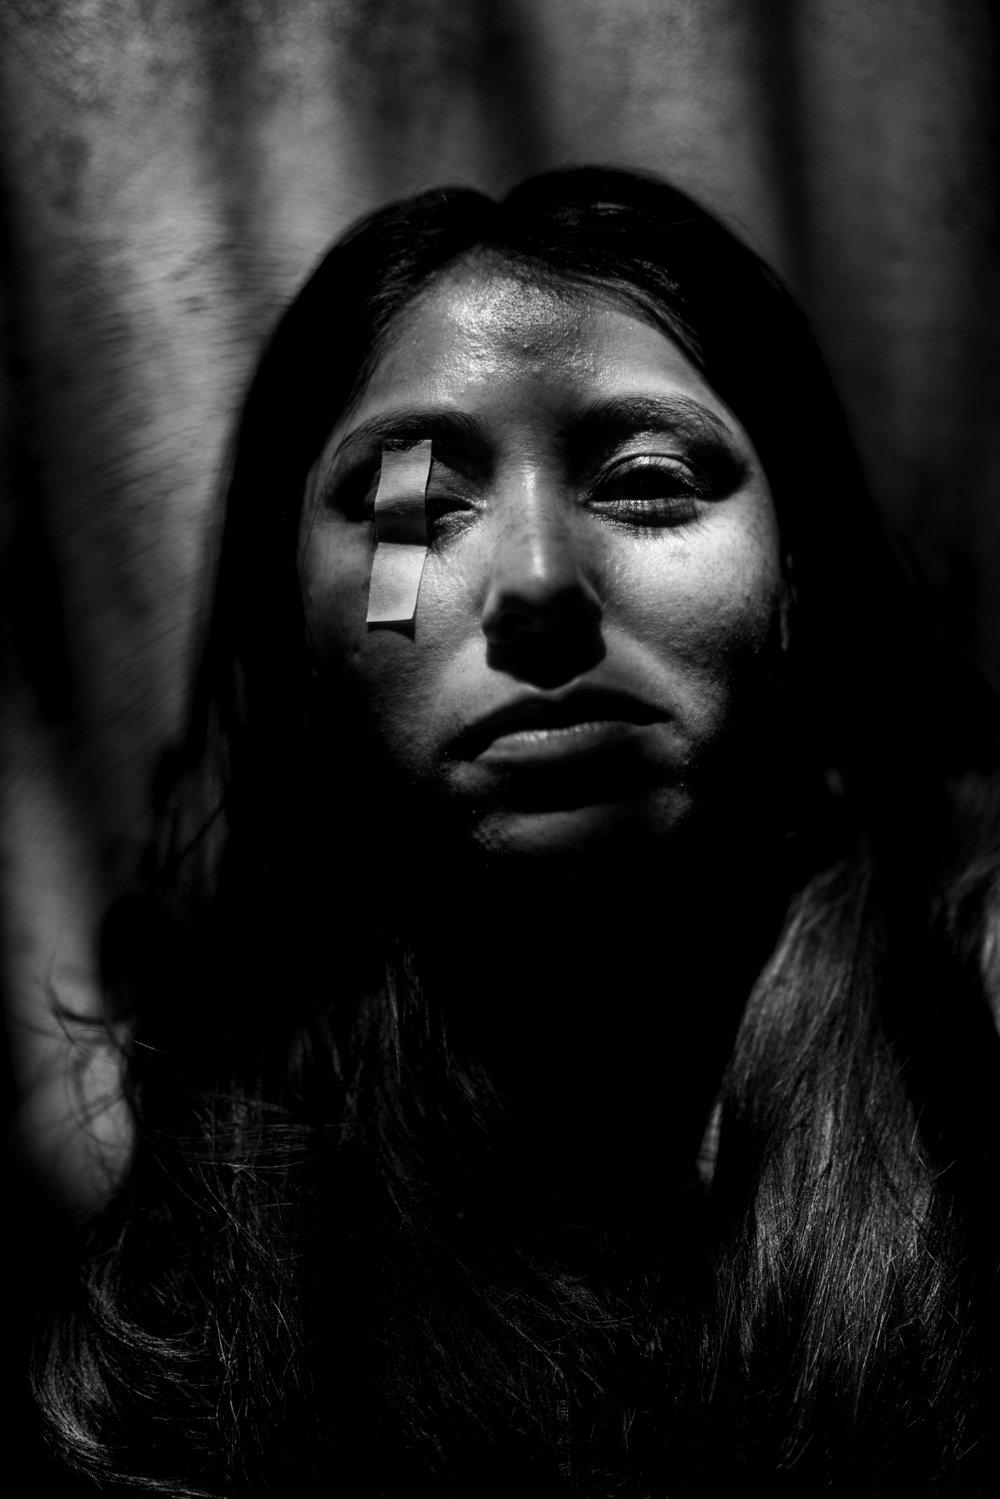 Dead Ringer/Self Portrait as Found Photograph (1979 Lima, Peru) 2018